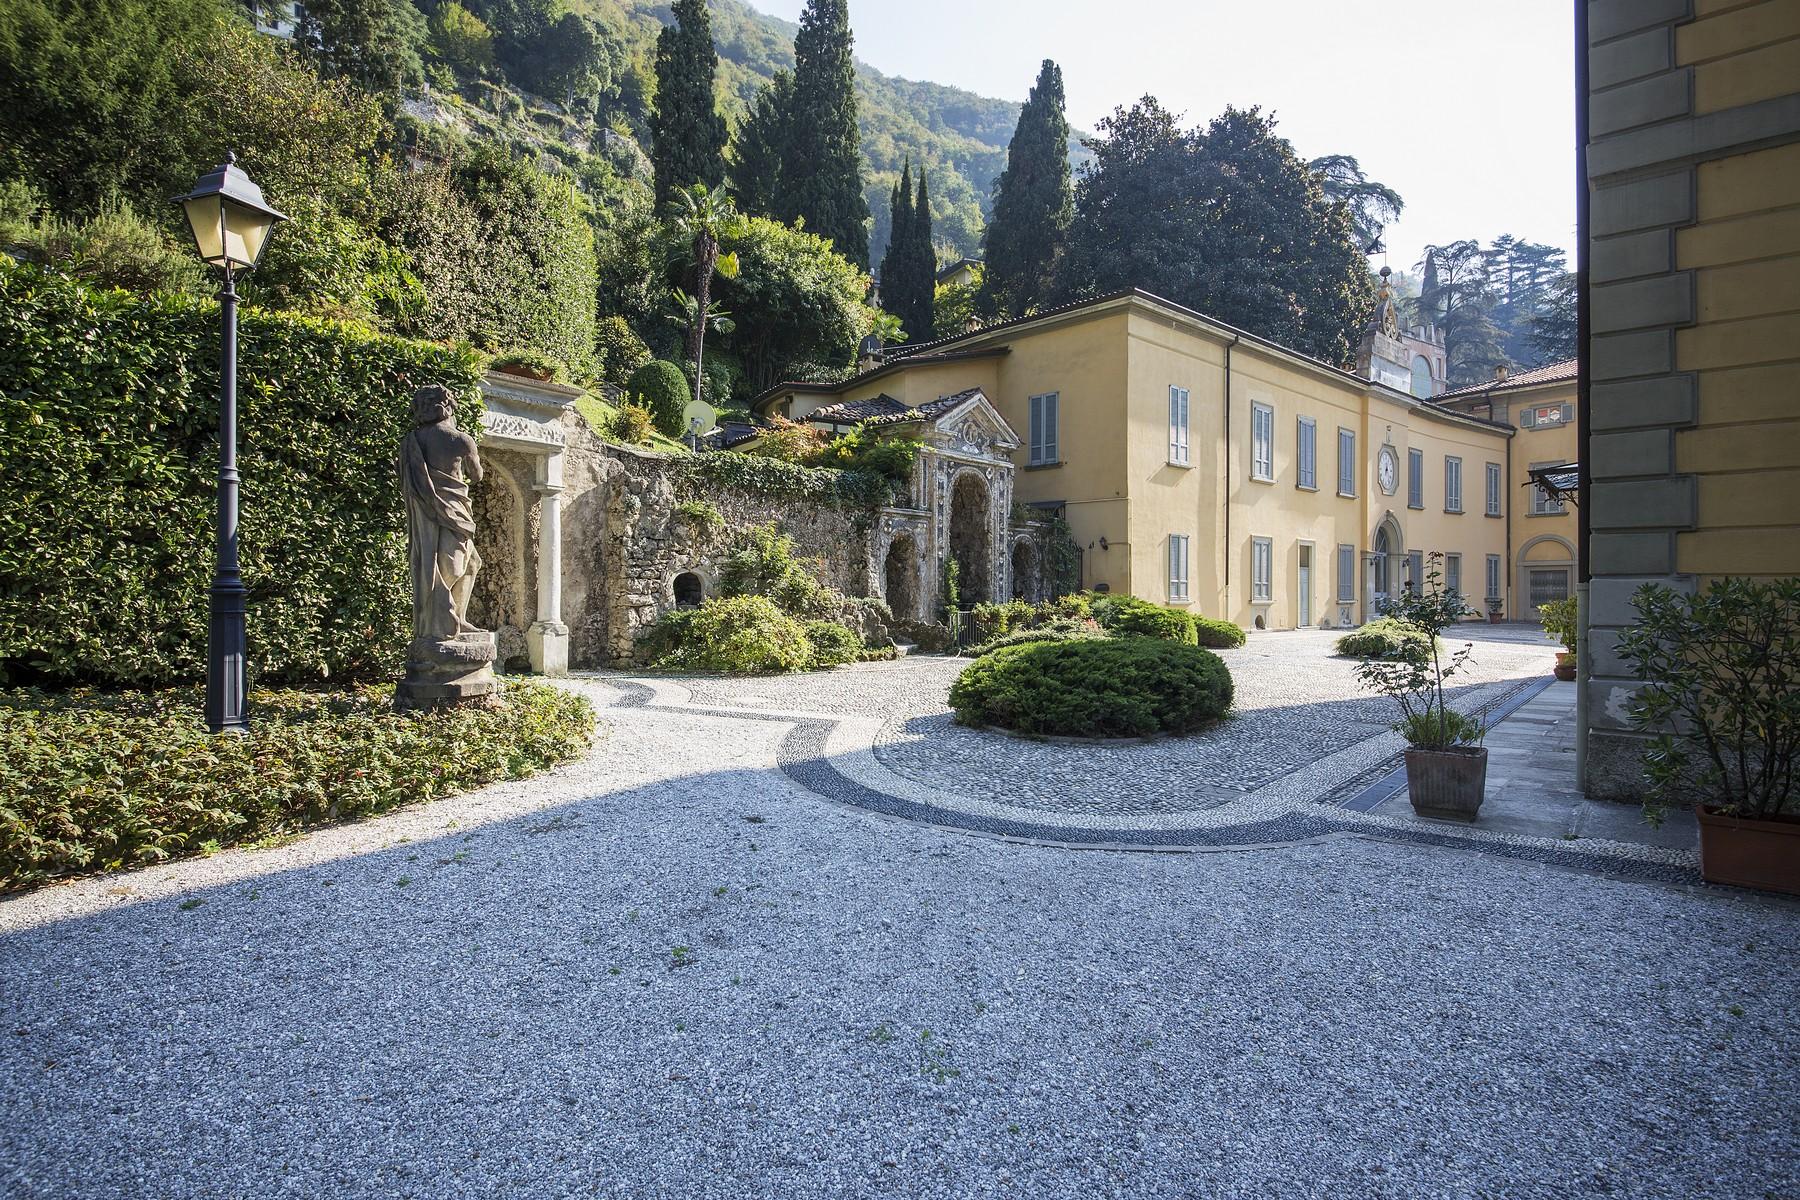 Additional photo for property listing at Elegant apartment in Villa Taverna via Roma Torno, Como 22020 Italia